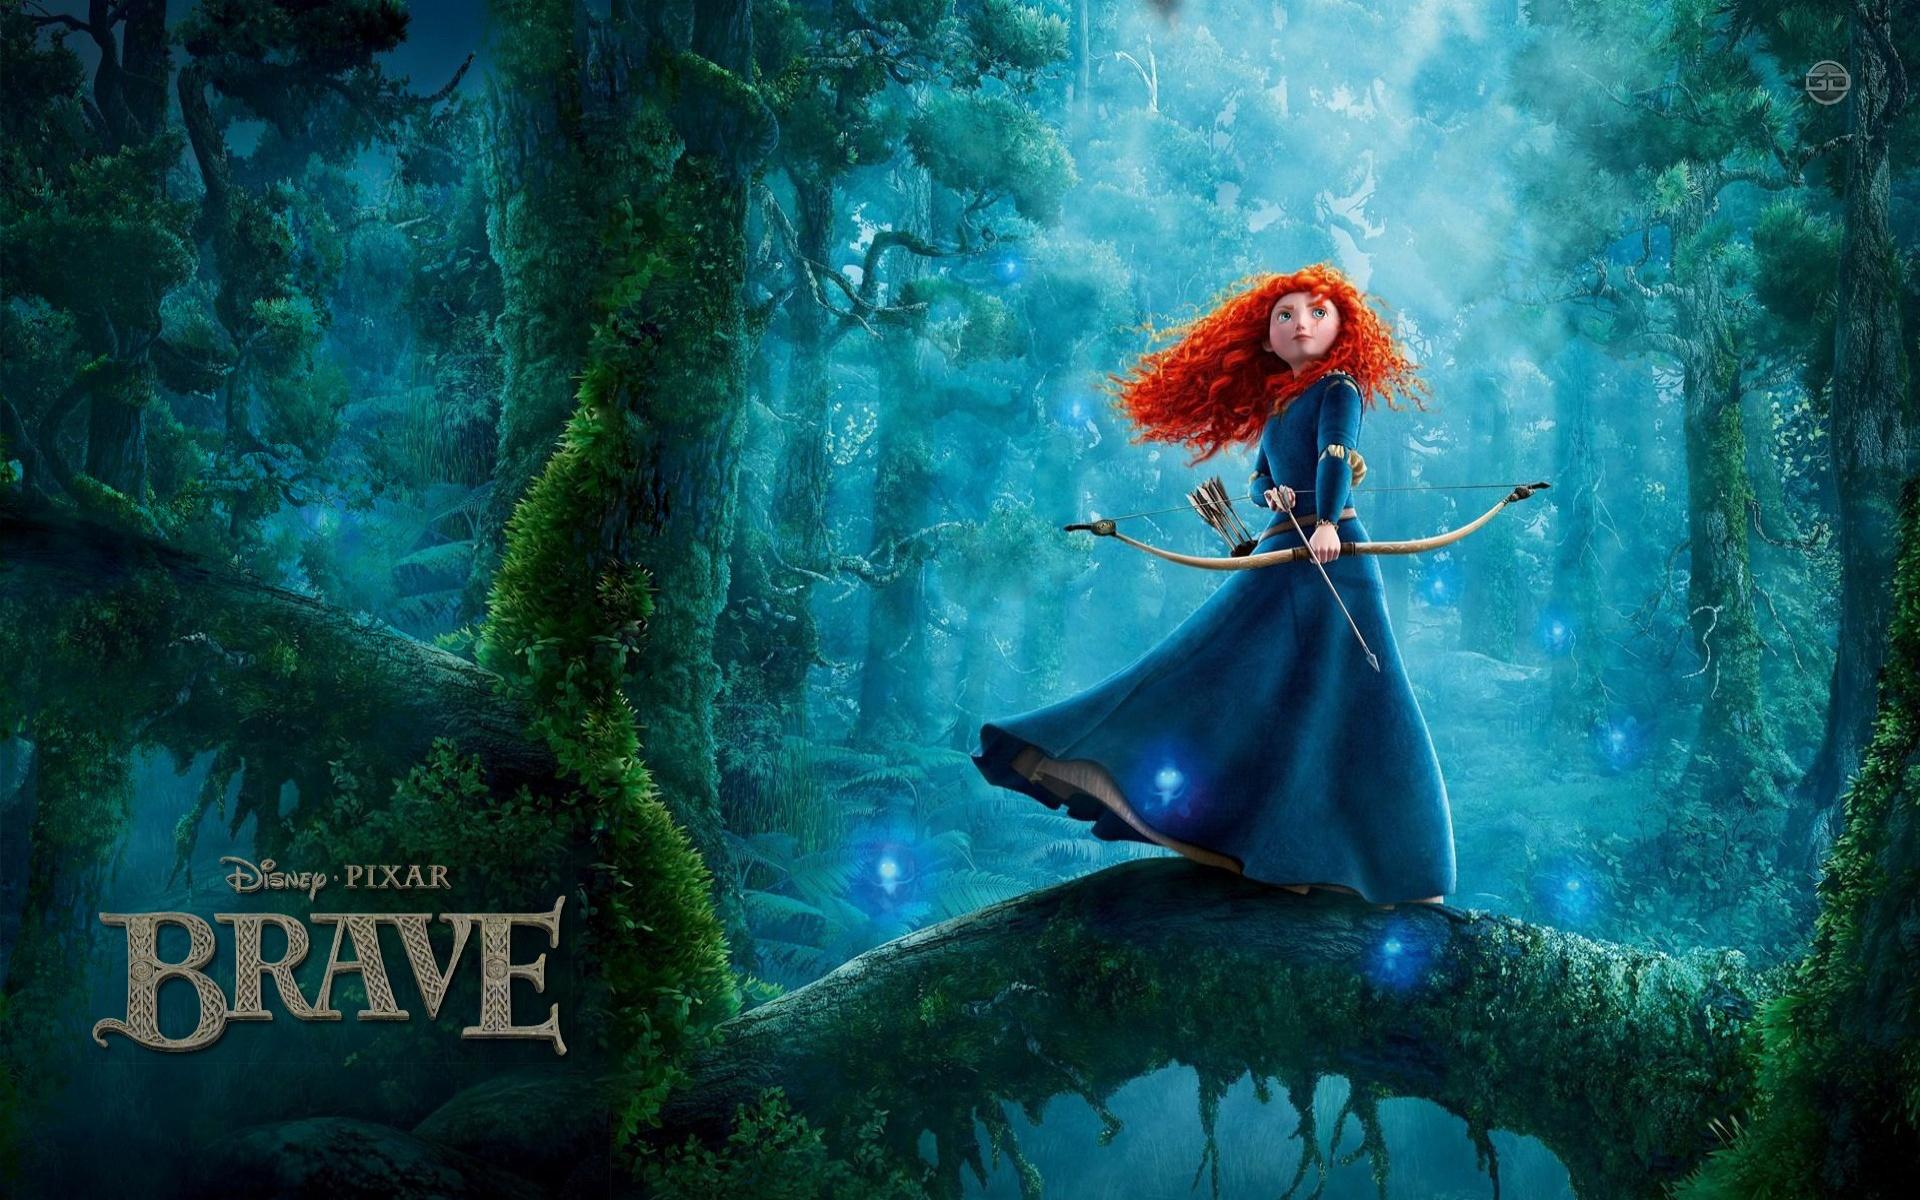 Brave Movie Disney Movie Wallpapers Hd 1920x1200 Download Hd Wallpaper Wallpapertip